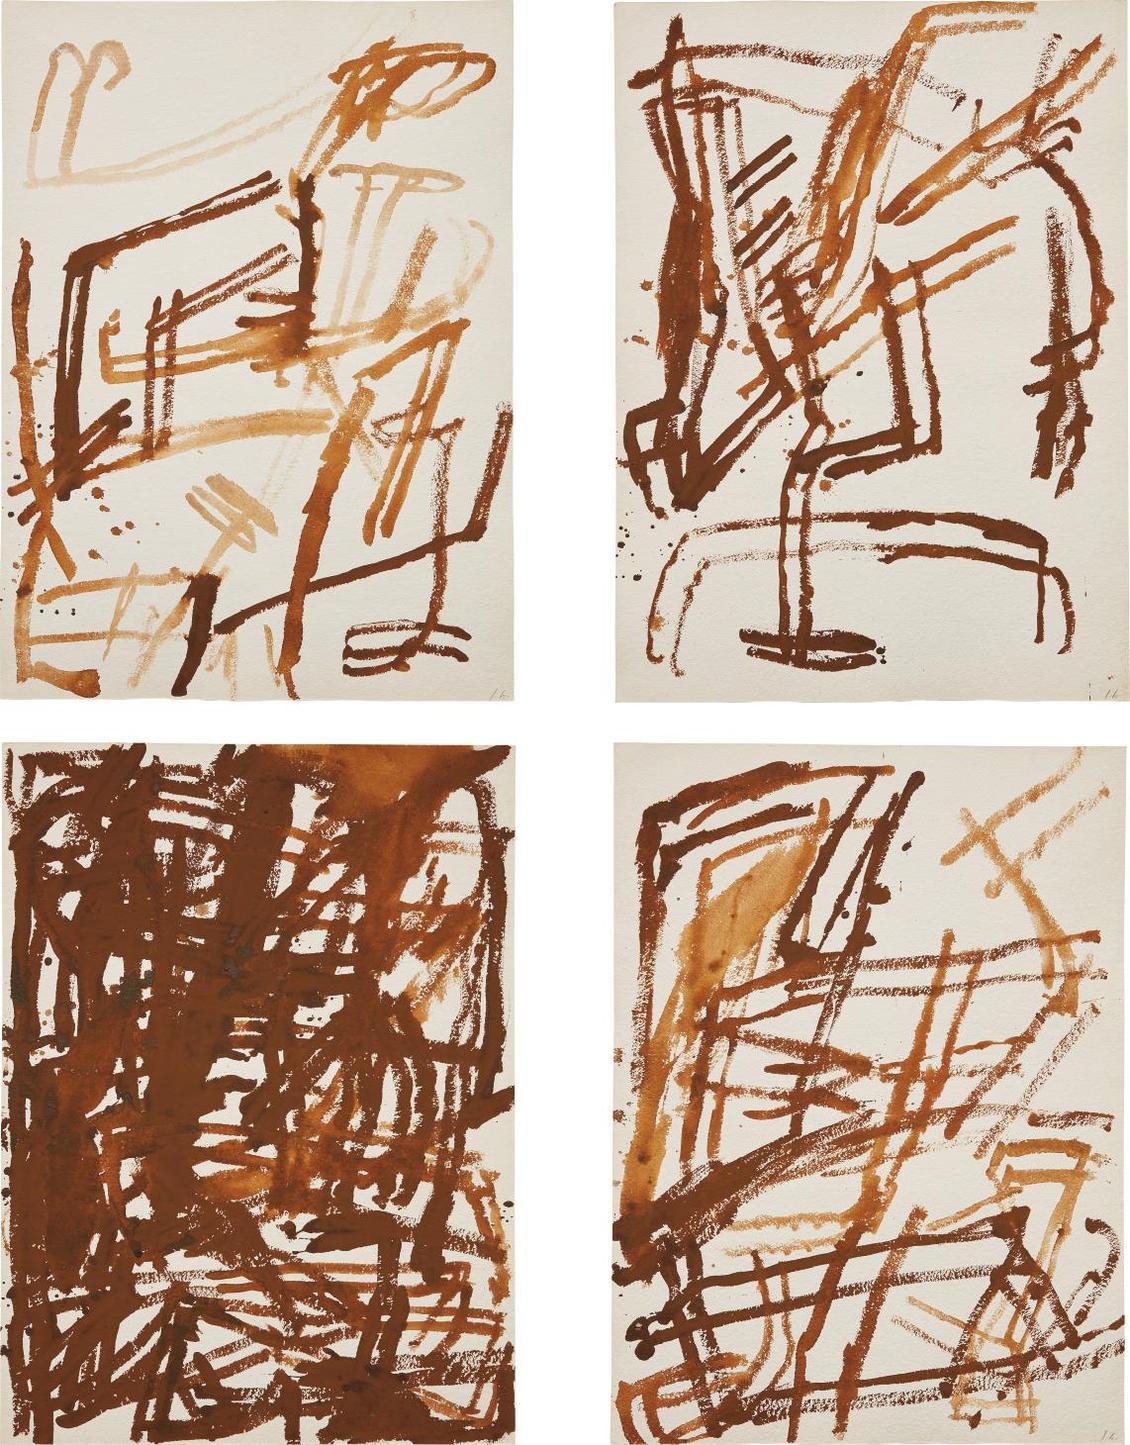 James Brown-Four Works: (i) Untitled IV; (ii) Untitled VI; (iii) Untitled VII; (iv) Untitled X-1986